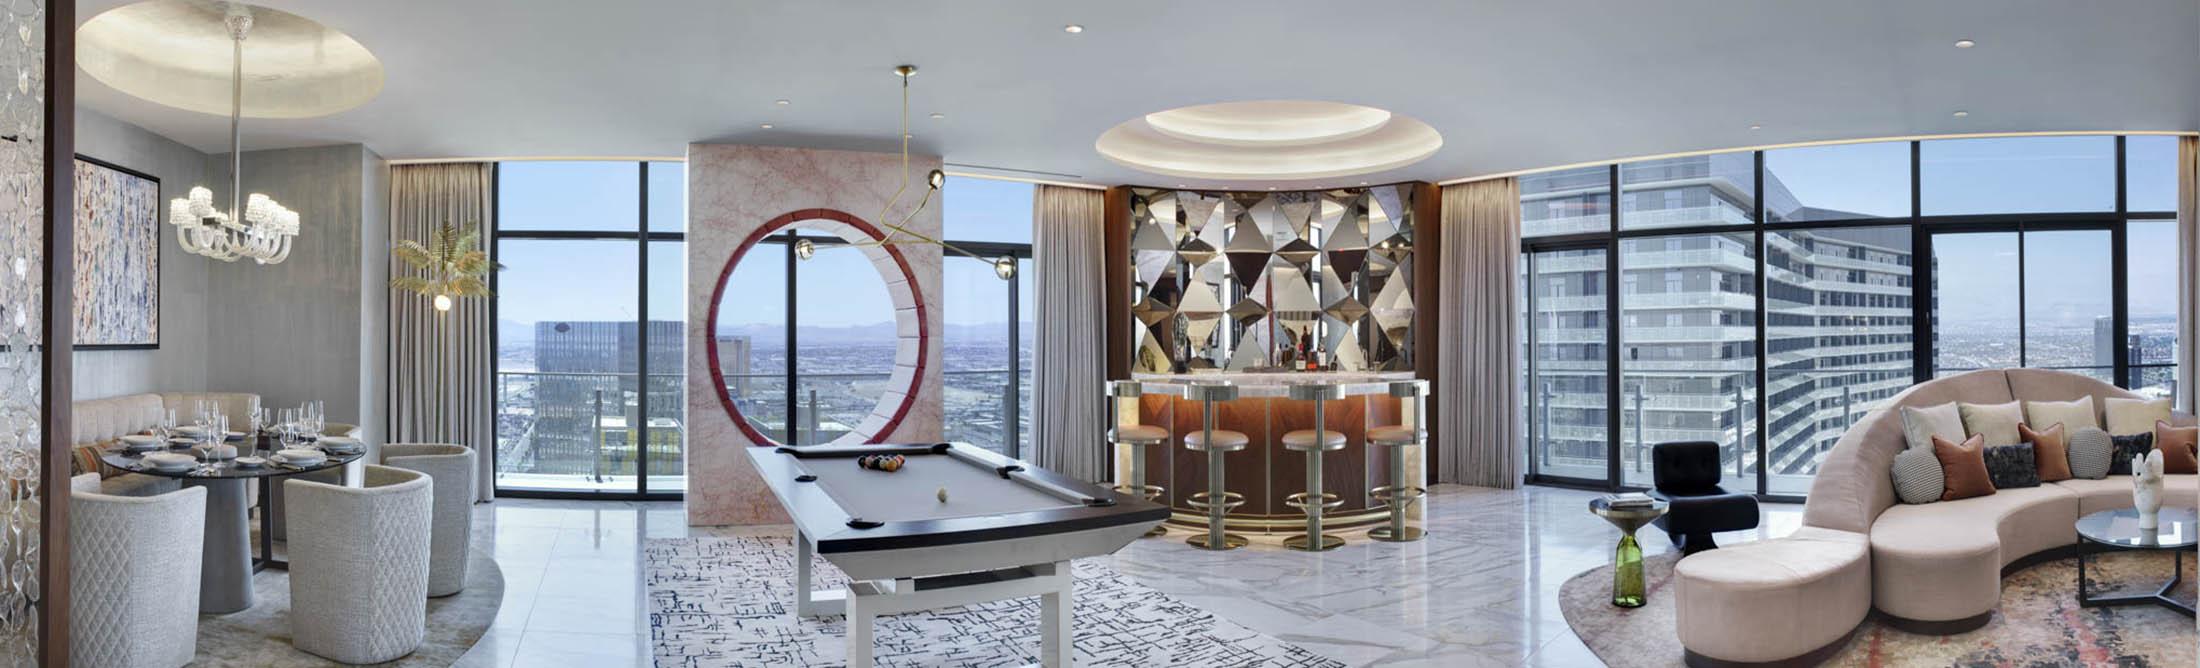 Look Inside This Million-Dollar Vegas Hotel Room - Bloomberg